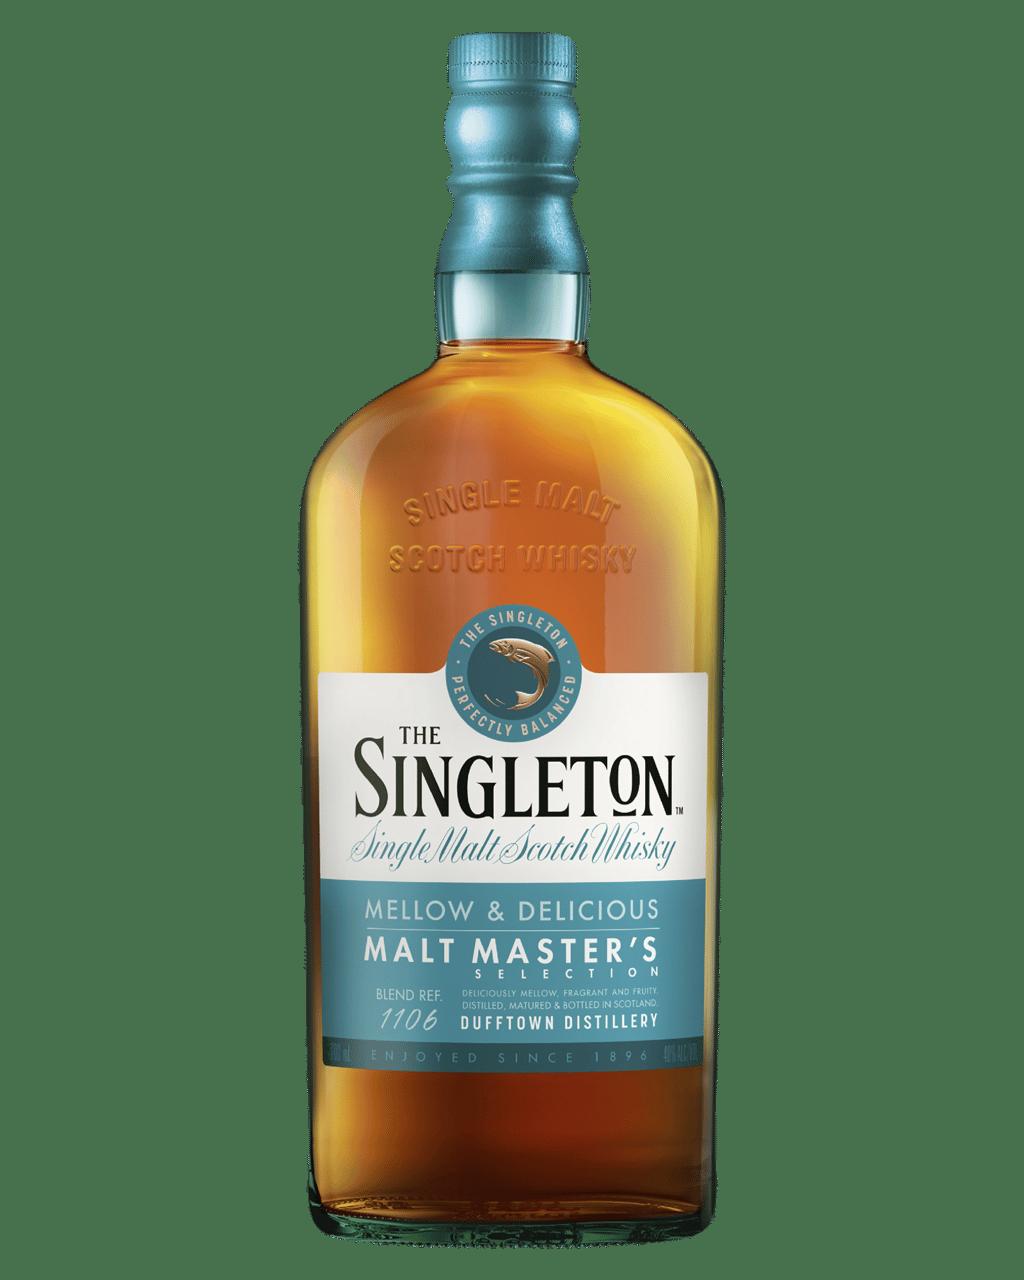 fb5ed8f6631 The Singleton of Dufftown Malt Master Single Malt Scotch Whisky 700mL